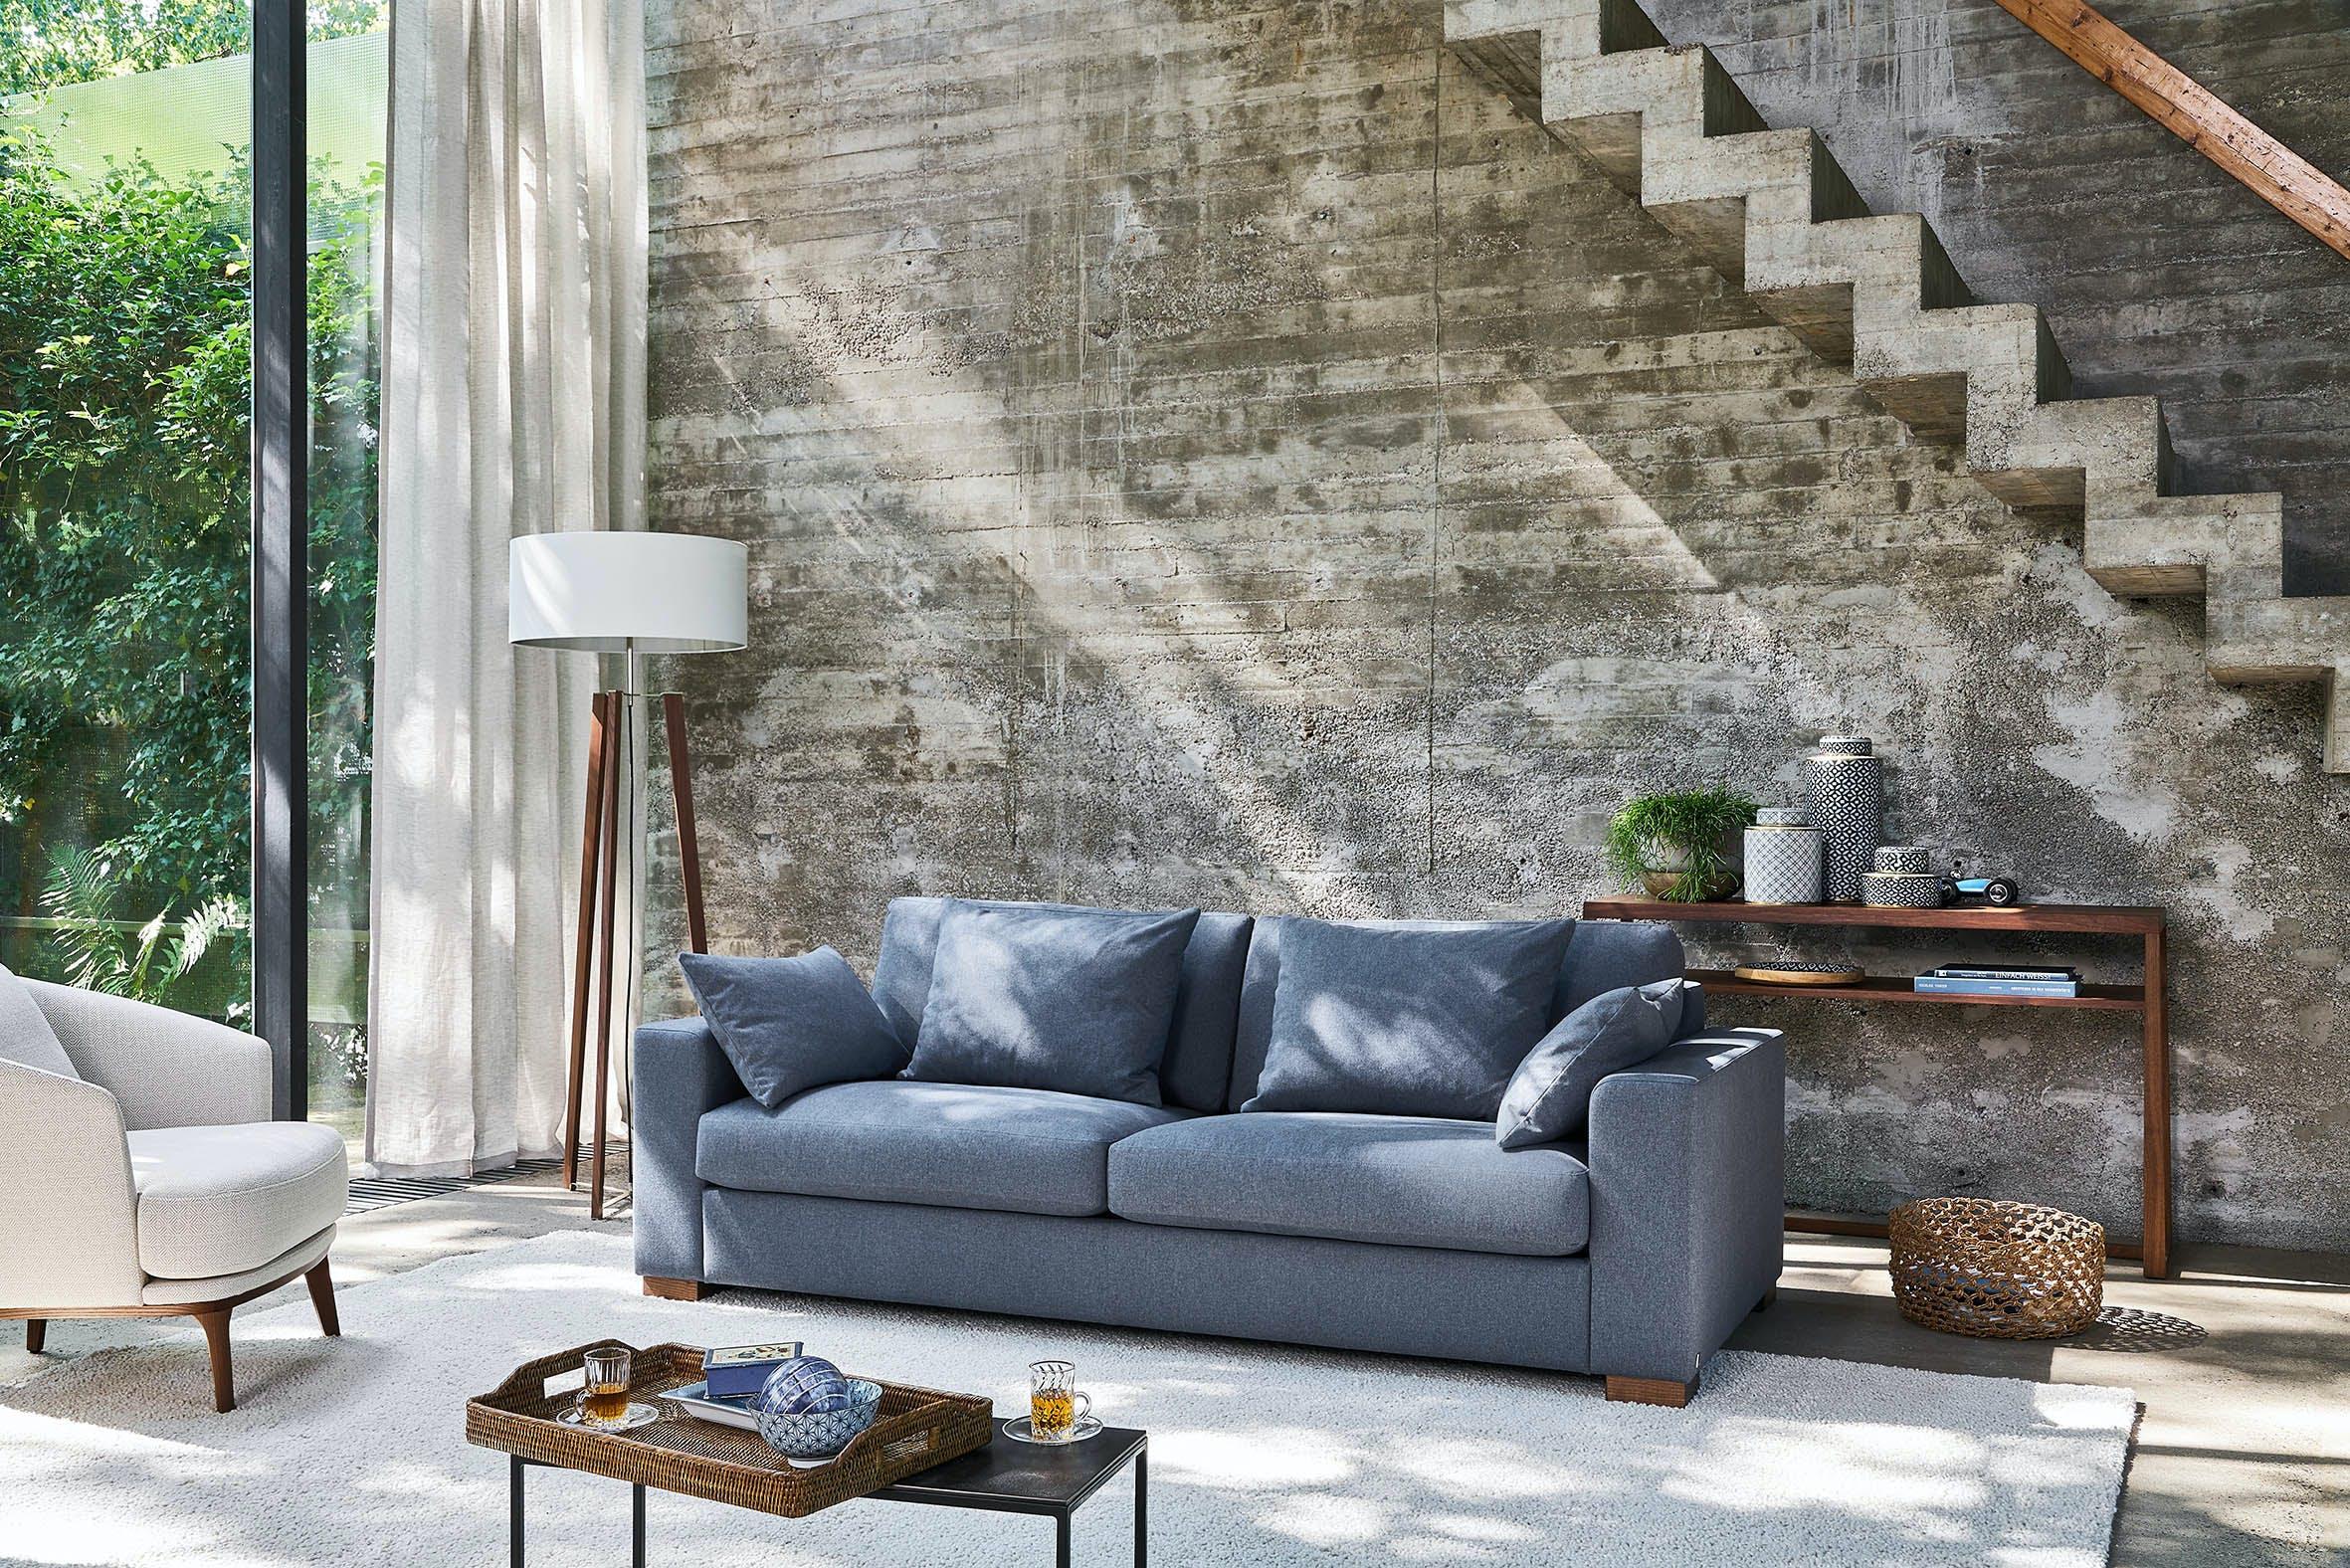 Jab Anstoetz Blue Inspiration Sofa Insitu Haute Living